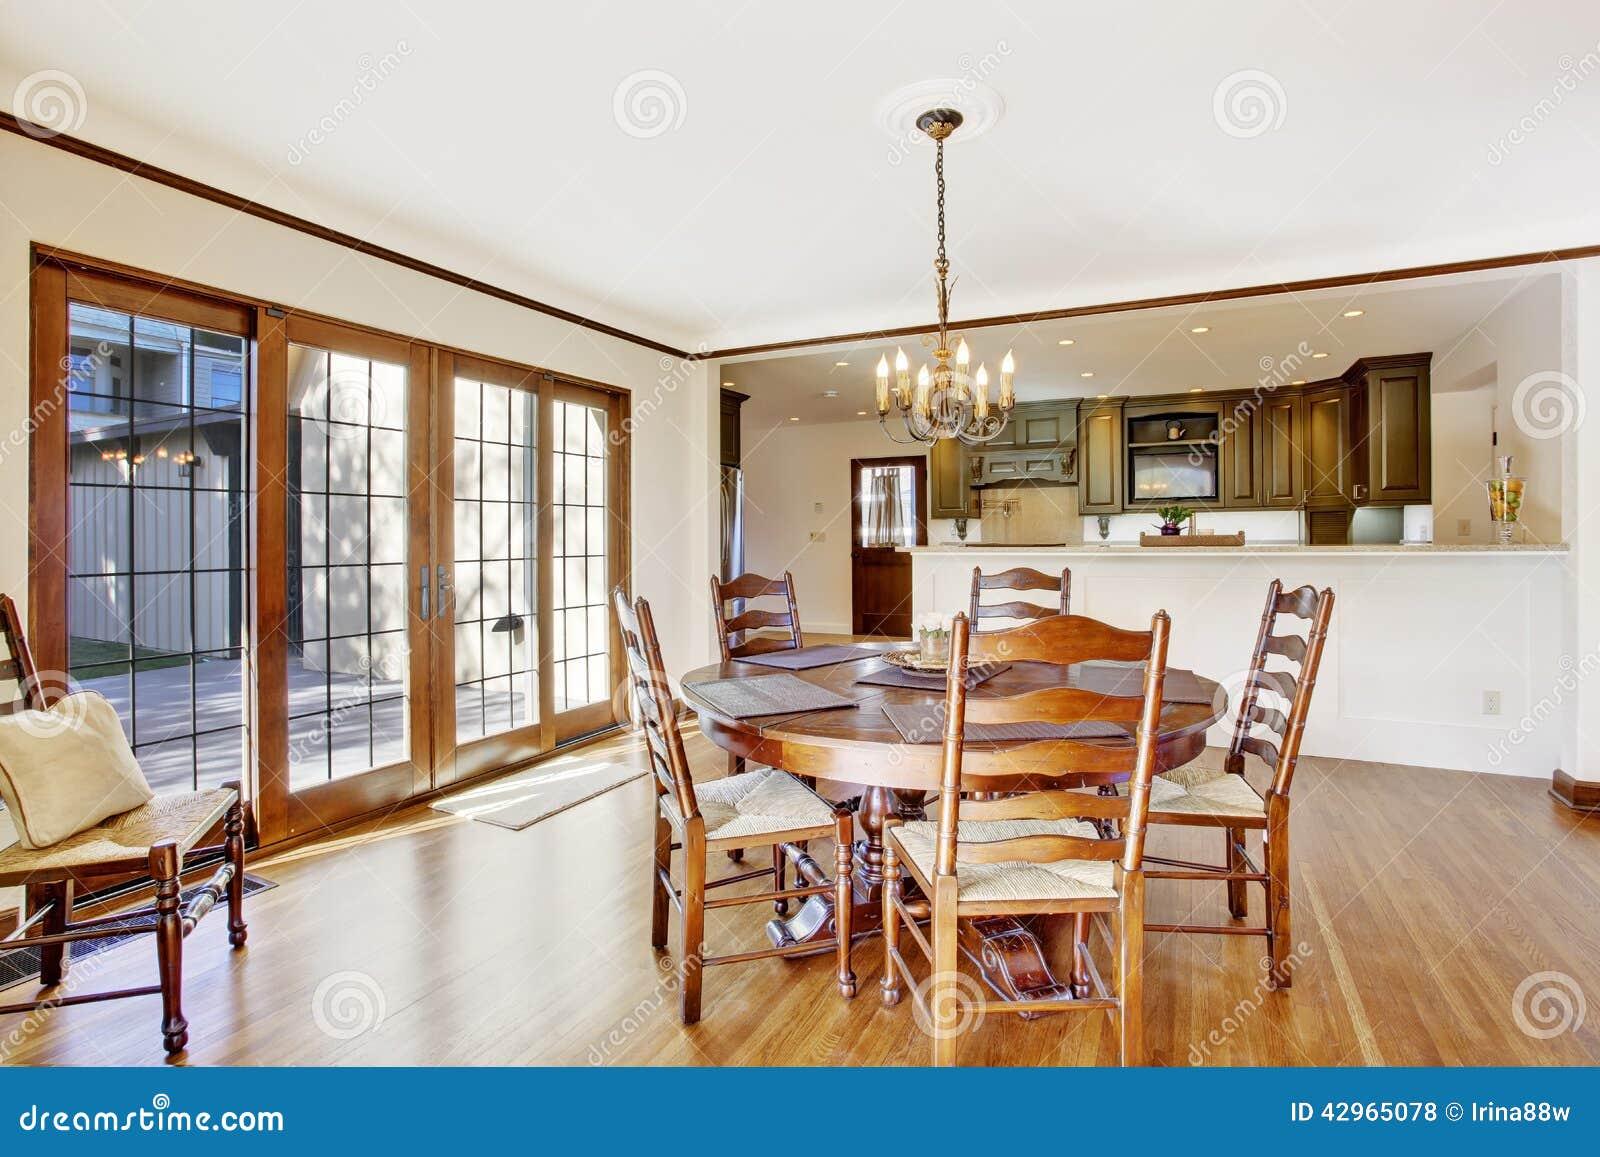 Salle a manger moderne avec table ronde for Salle a manger de luxe en bois